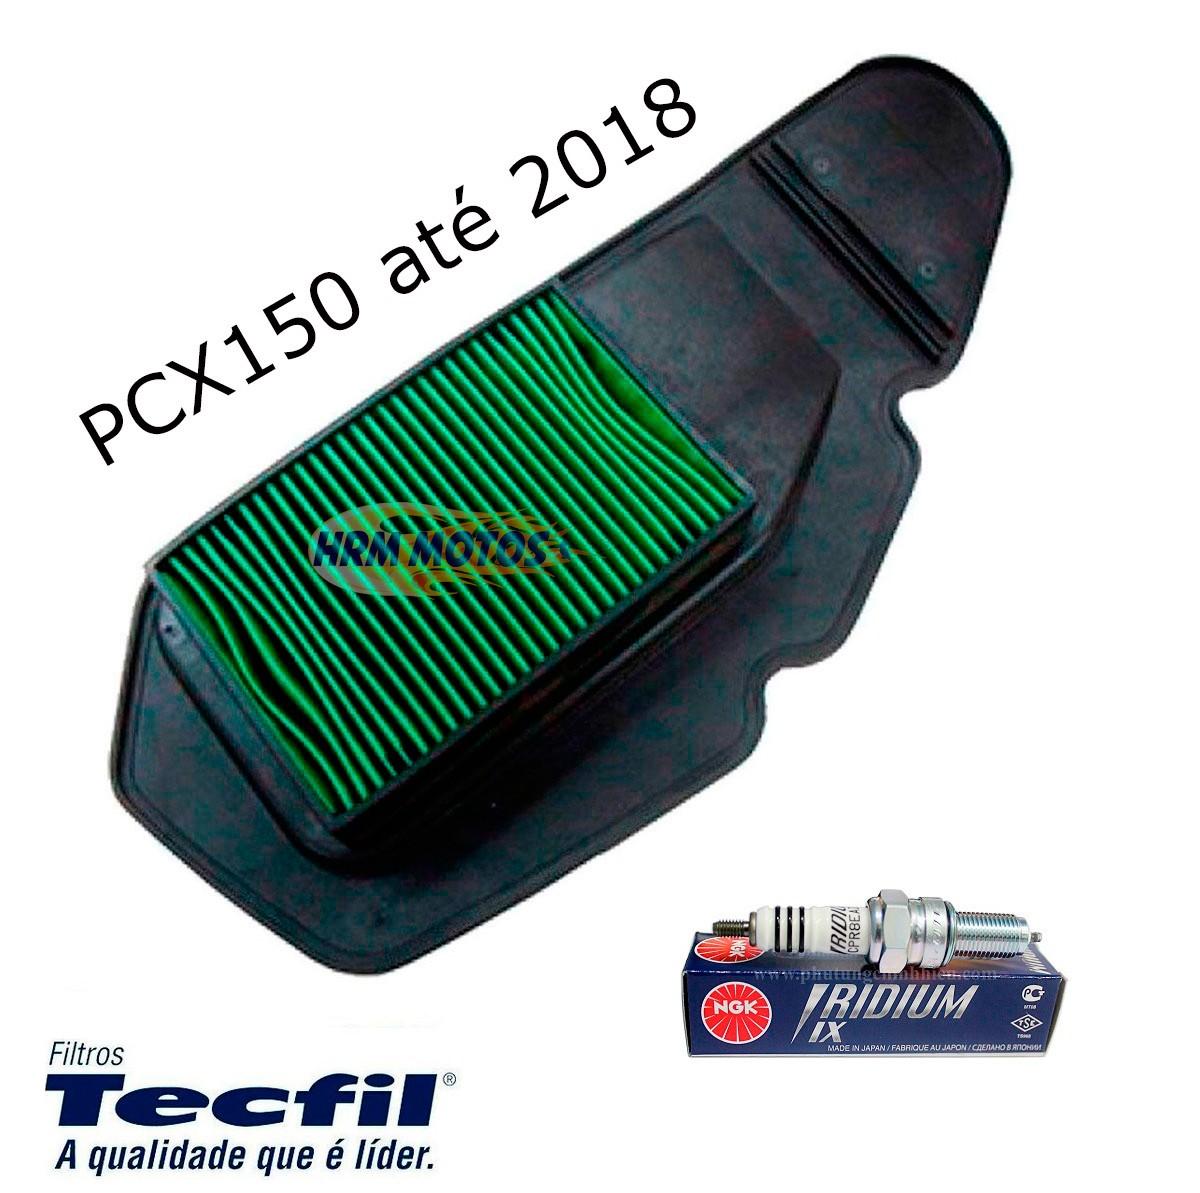 Combo Filtro Ar Honda Pcx 150 Tecfil + Vela Iridium Ngk